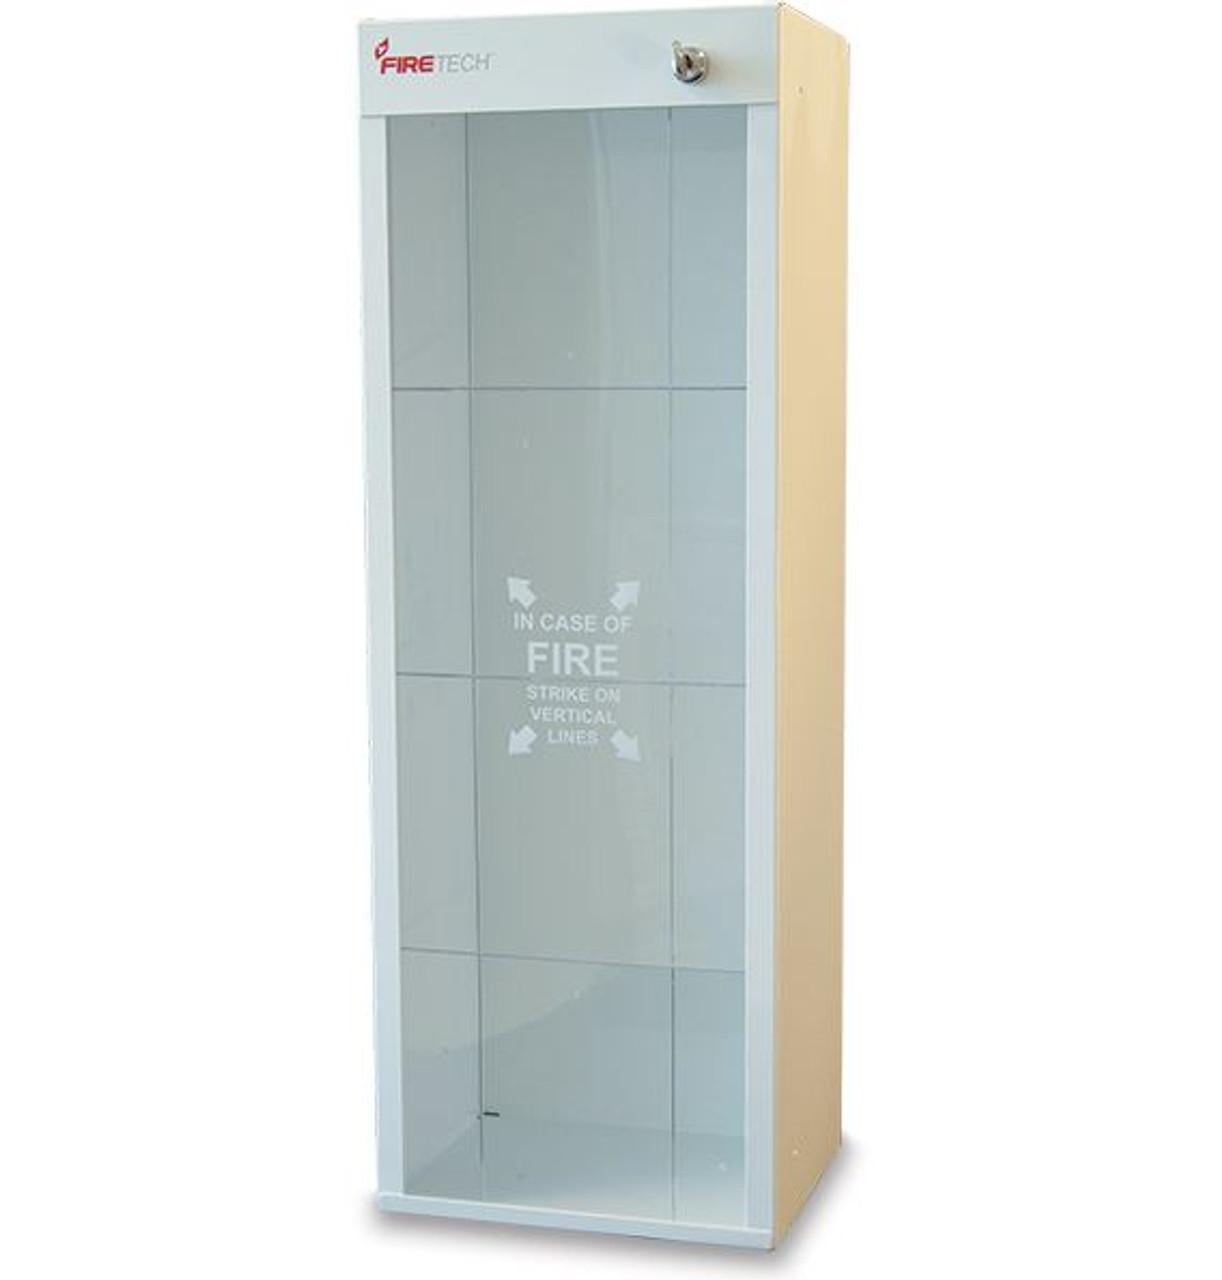 FT936 - Tall FireTech Metal Extinguisher Cabinet